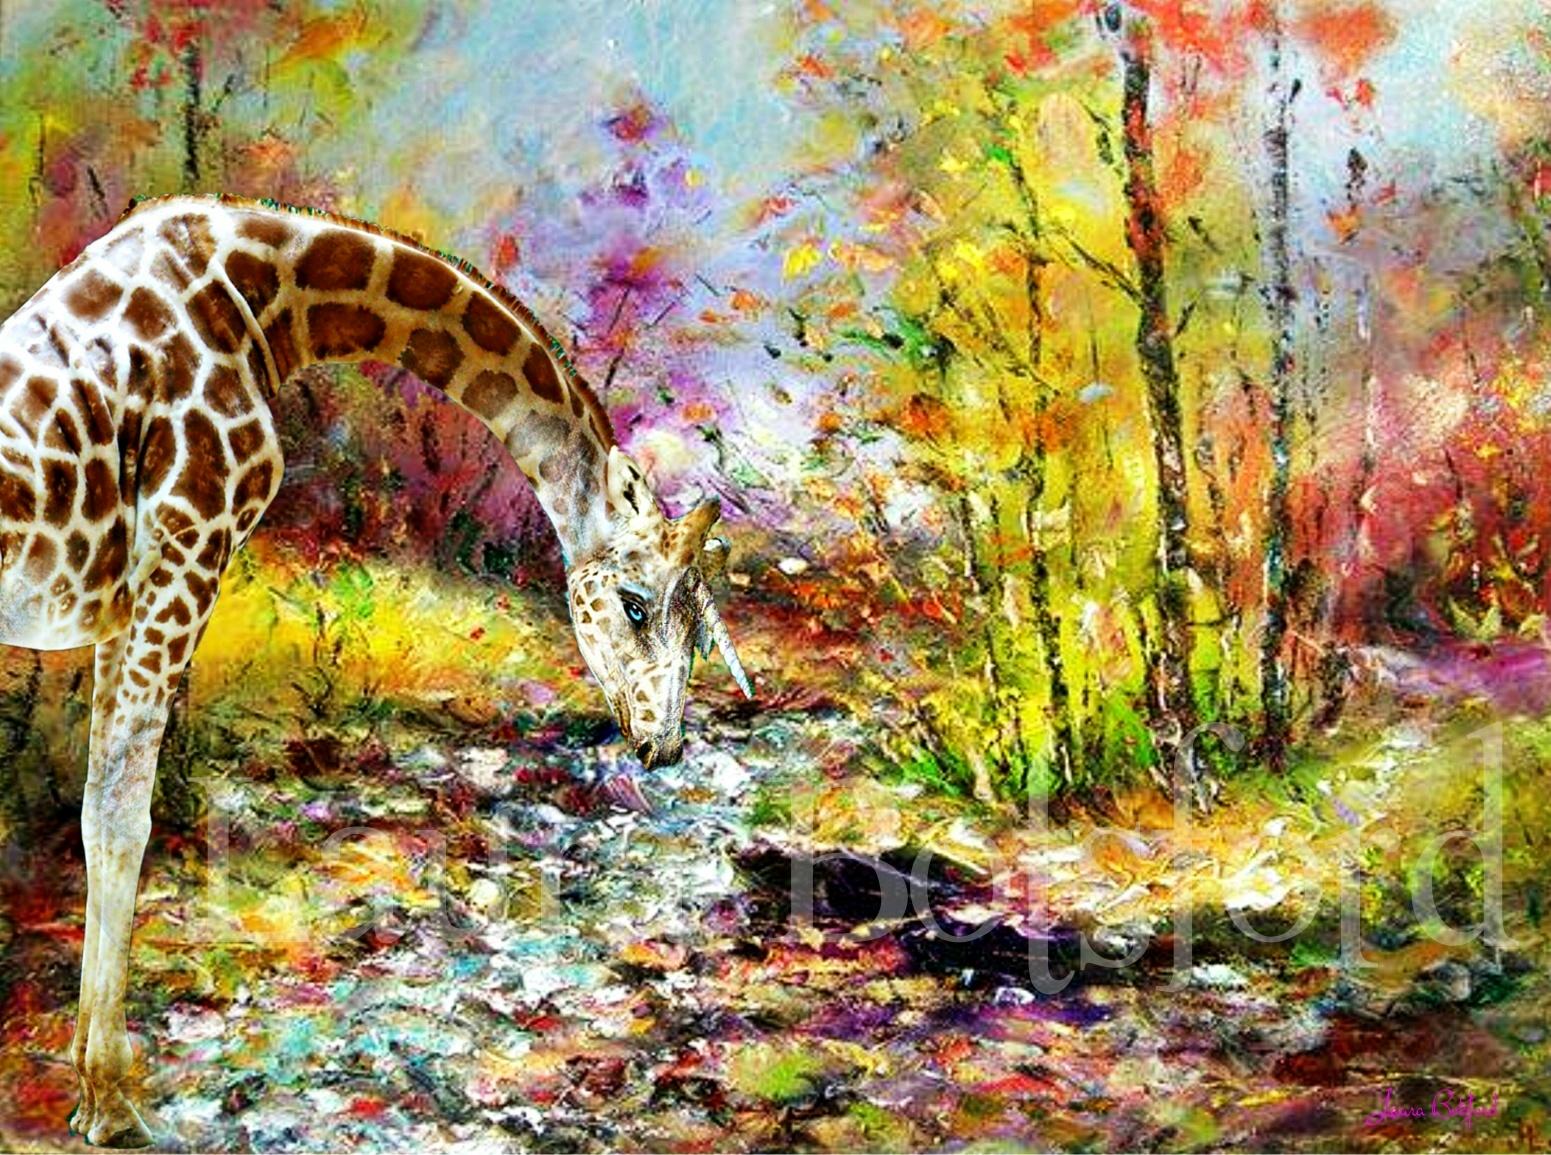 Unicorn Giraffe at the River